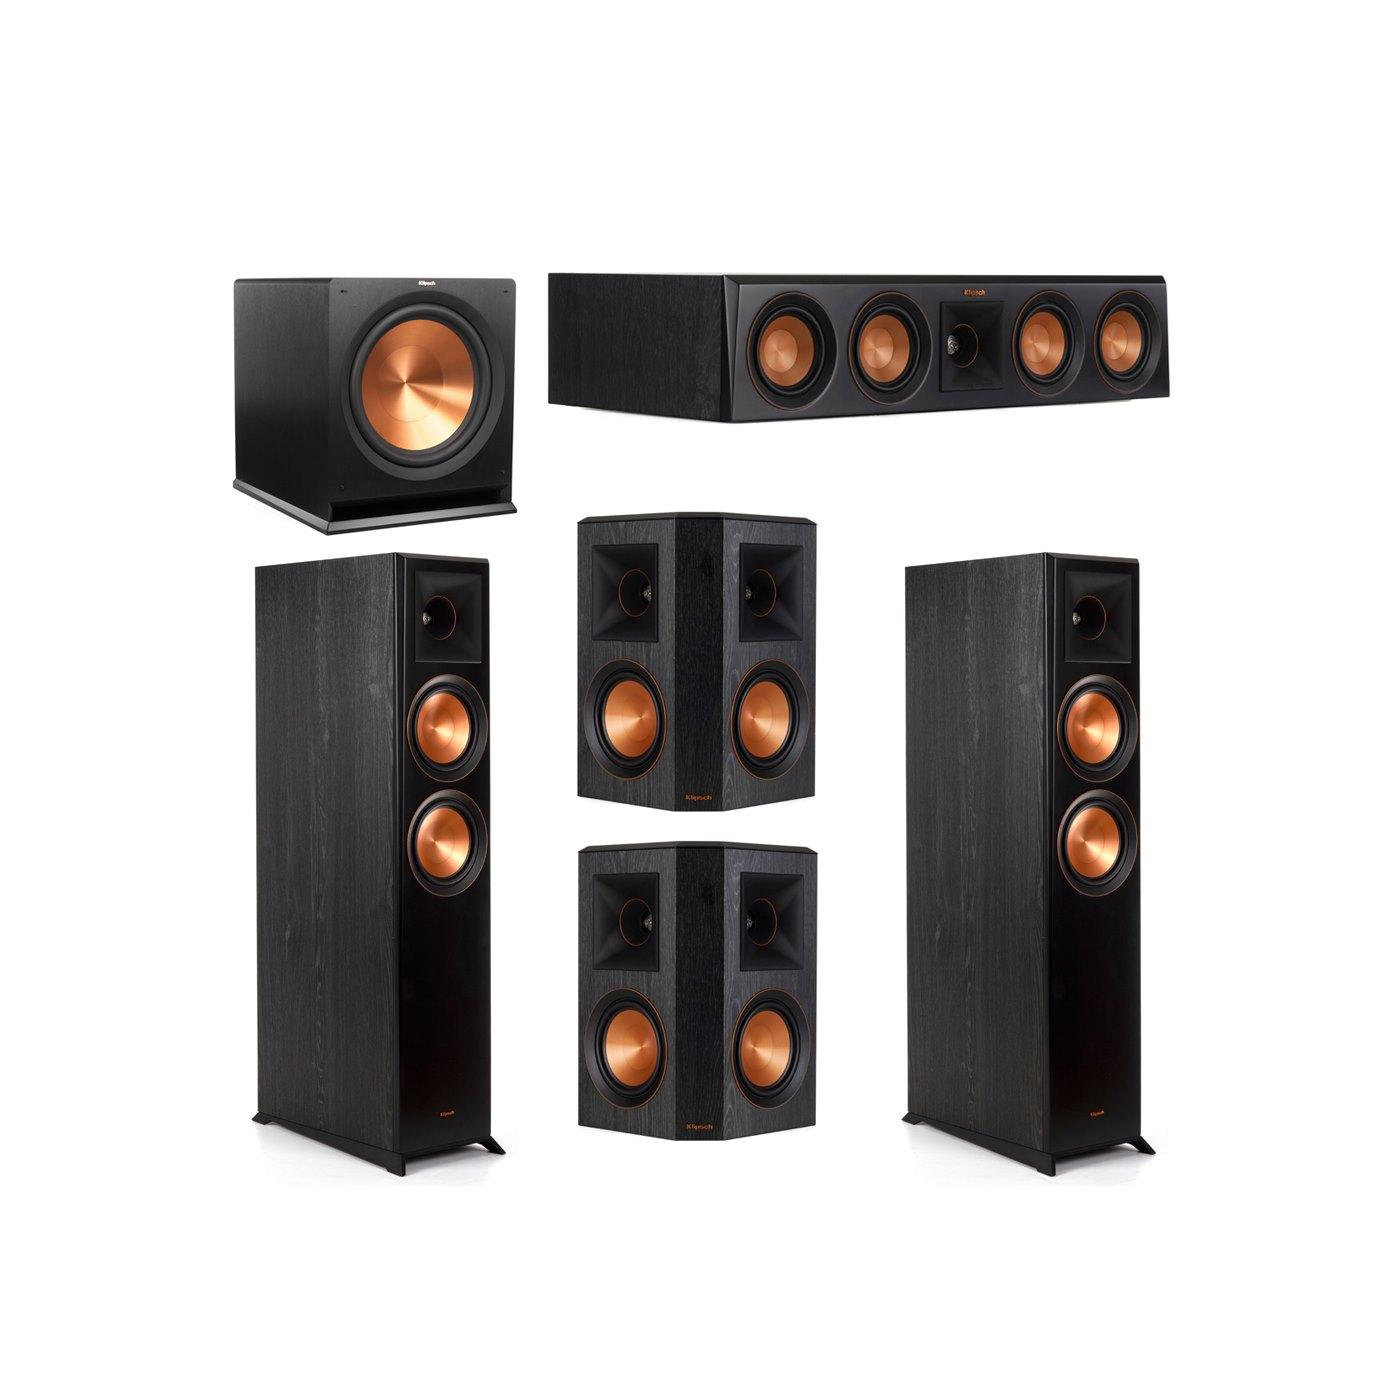 Klipsch 5.1 System with 2 RP-6000F Floorstanding Speakers, 1 Klipsch RP-404C Center Speaker, 2 Klipsch RP-502S Surround Speakers, 1 Klipsch R-115SW Subwoofer